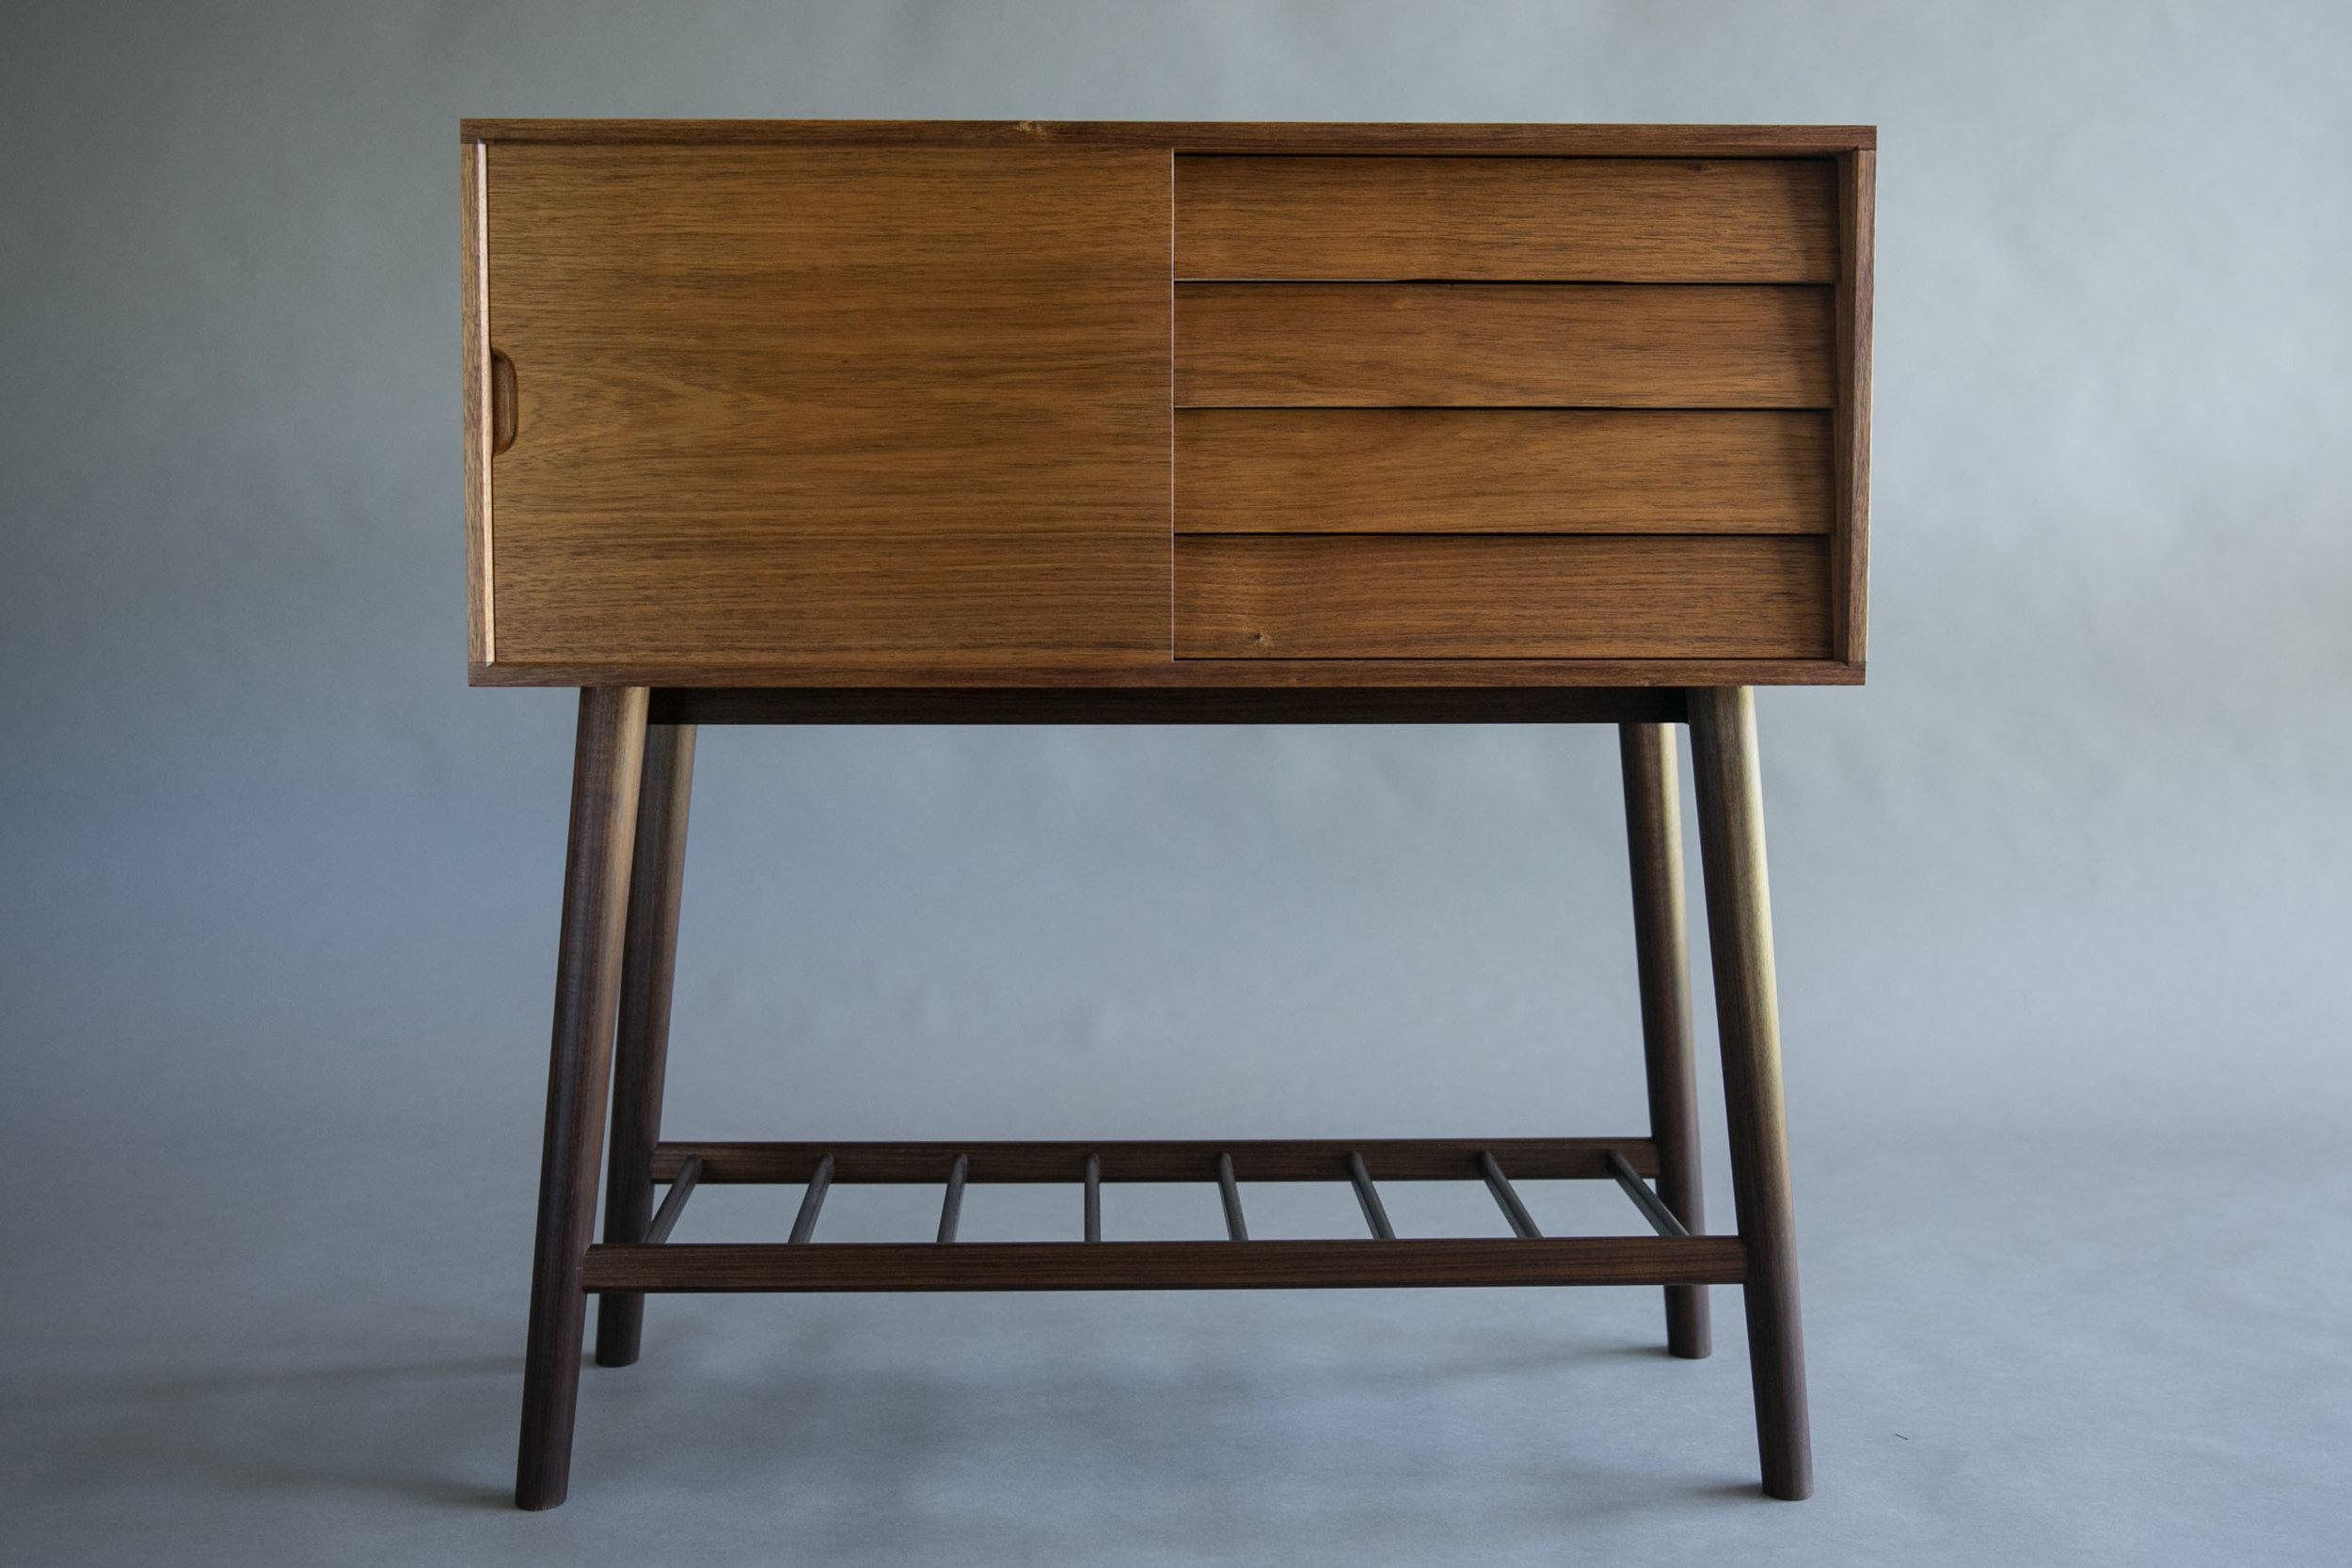 Reuben-Sturt-Furniture-1.jpg